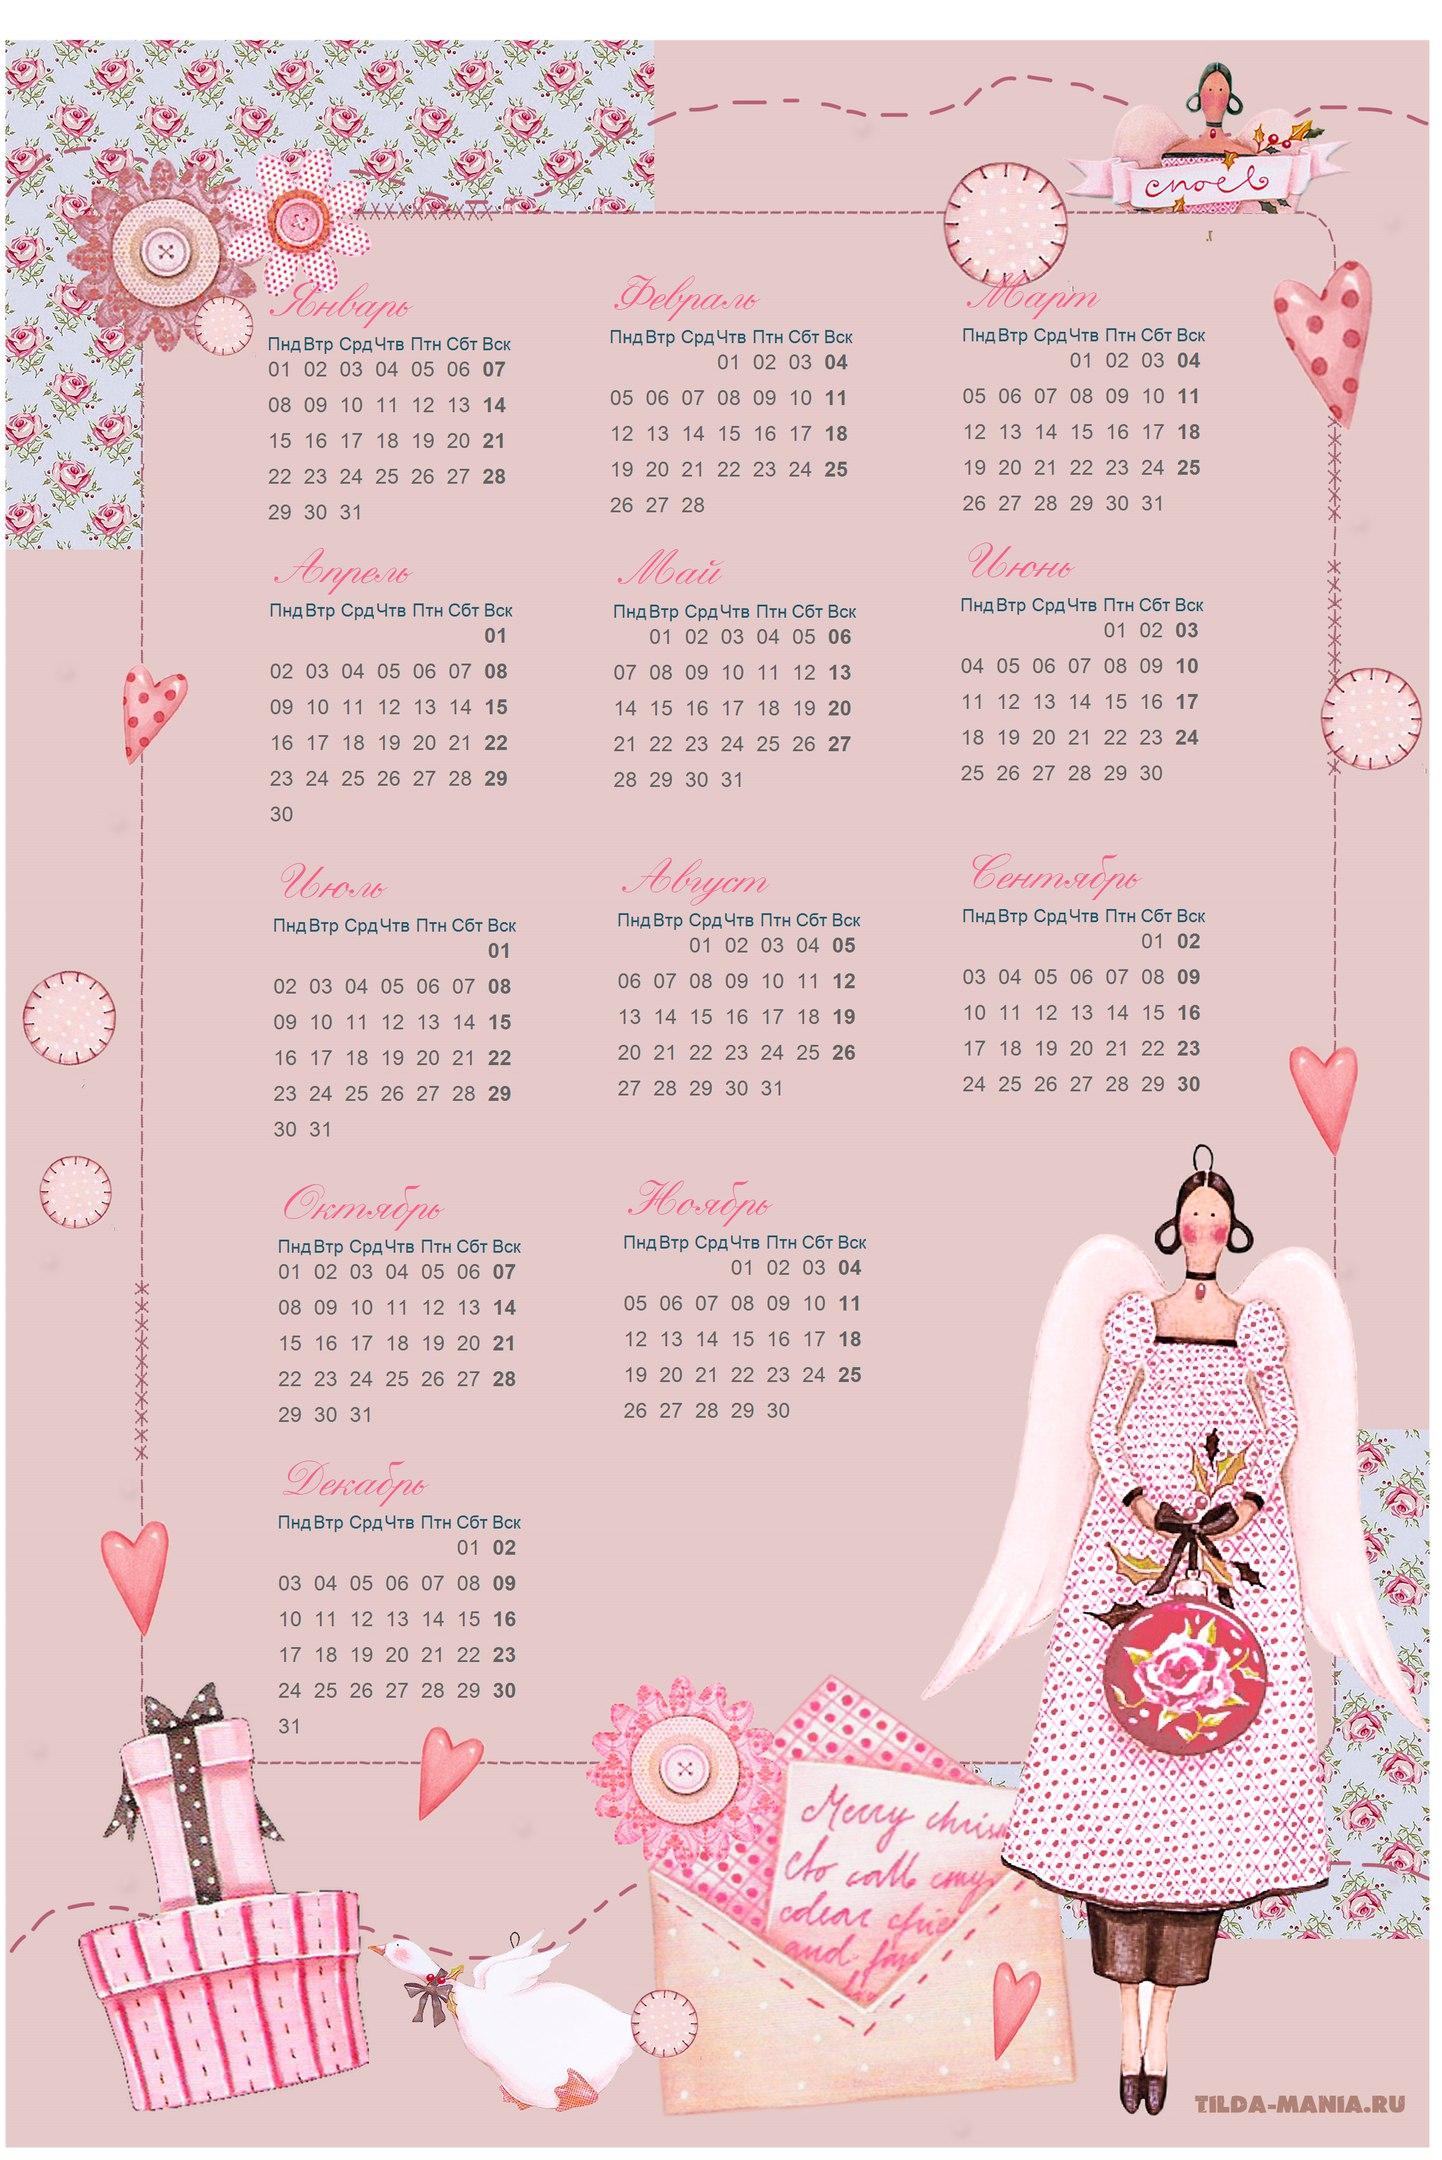 календарь в стиле тильда